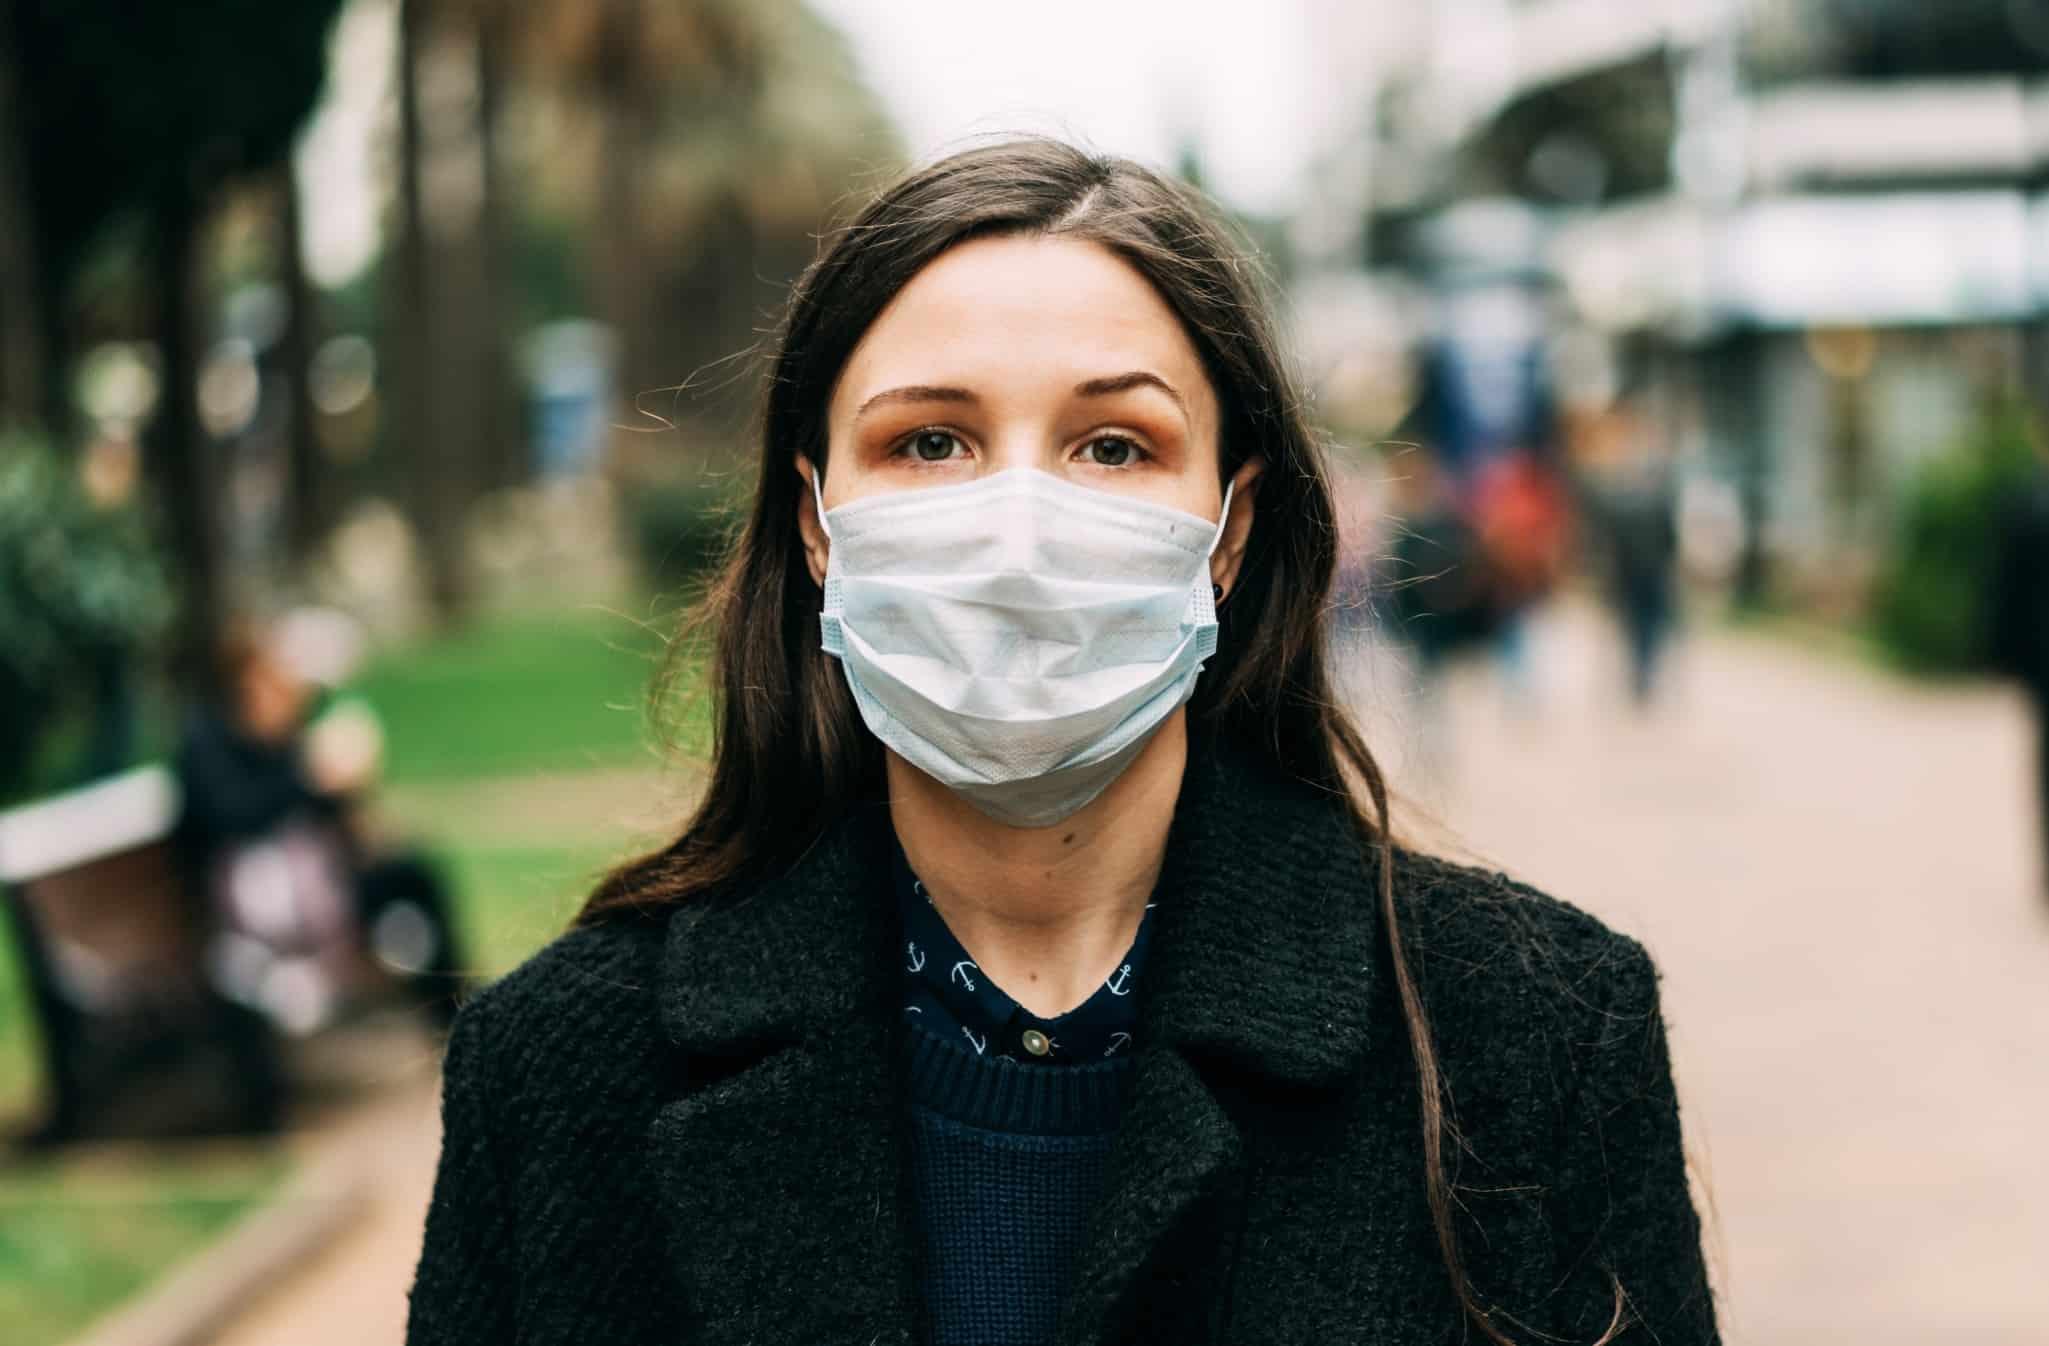 mulher na rua com máscara facial